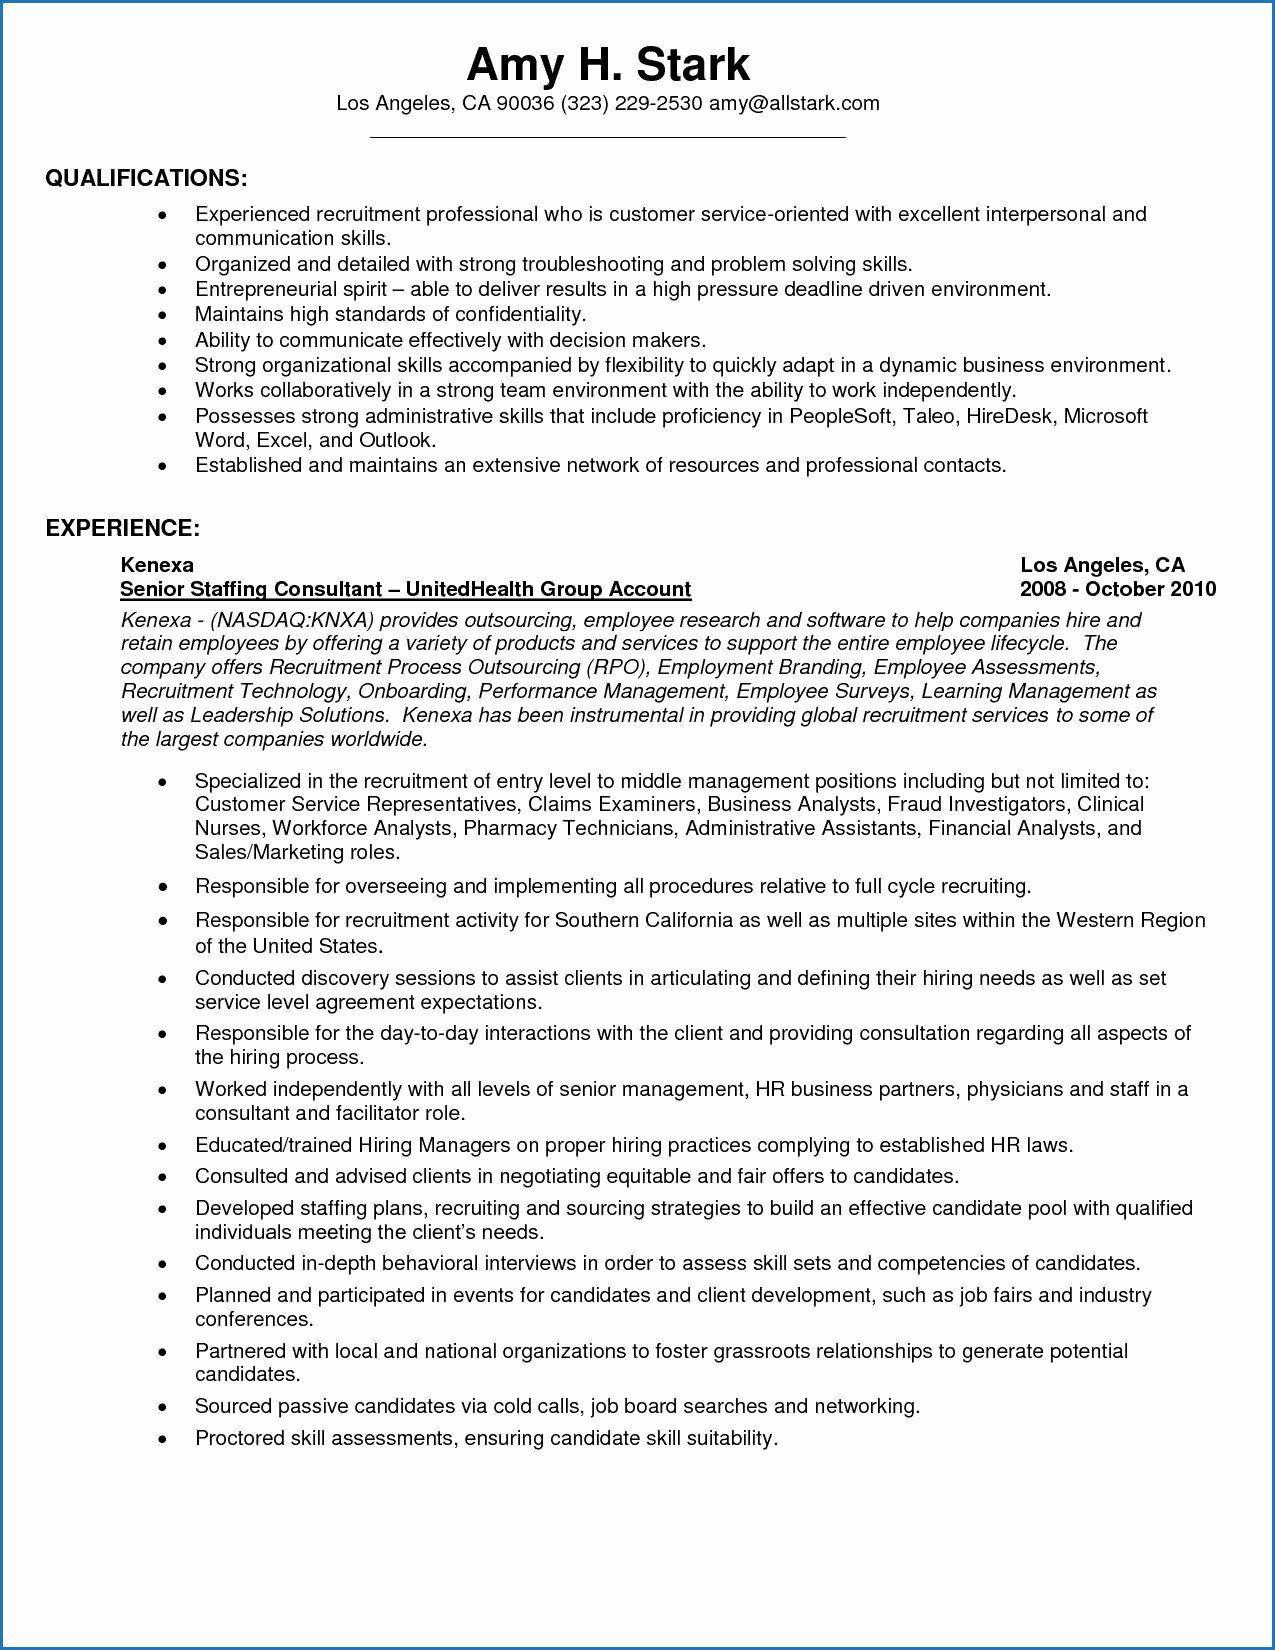 32 beautiful leadership skills examples for resume in 2020